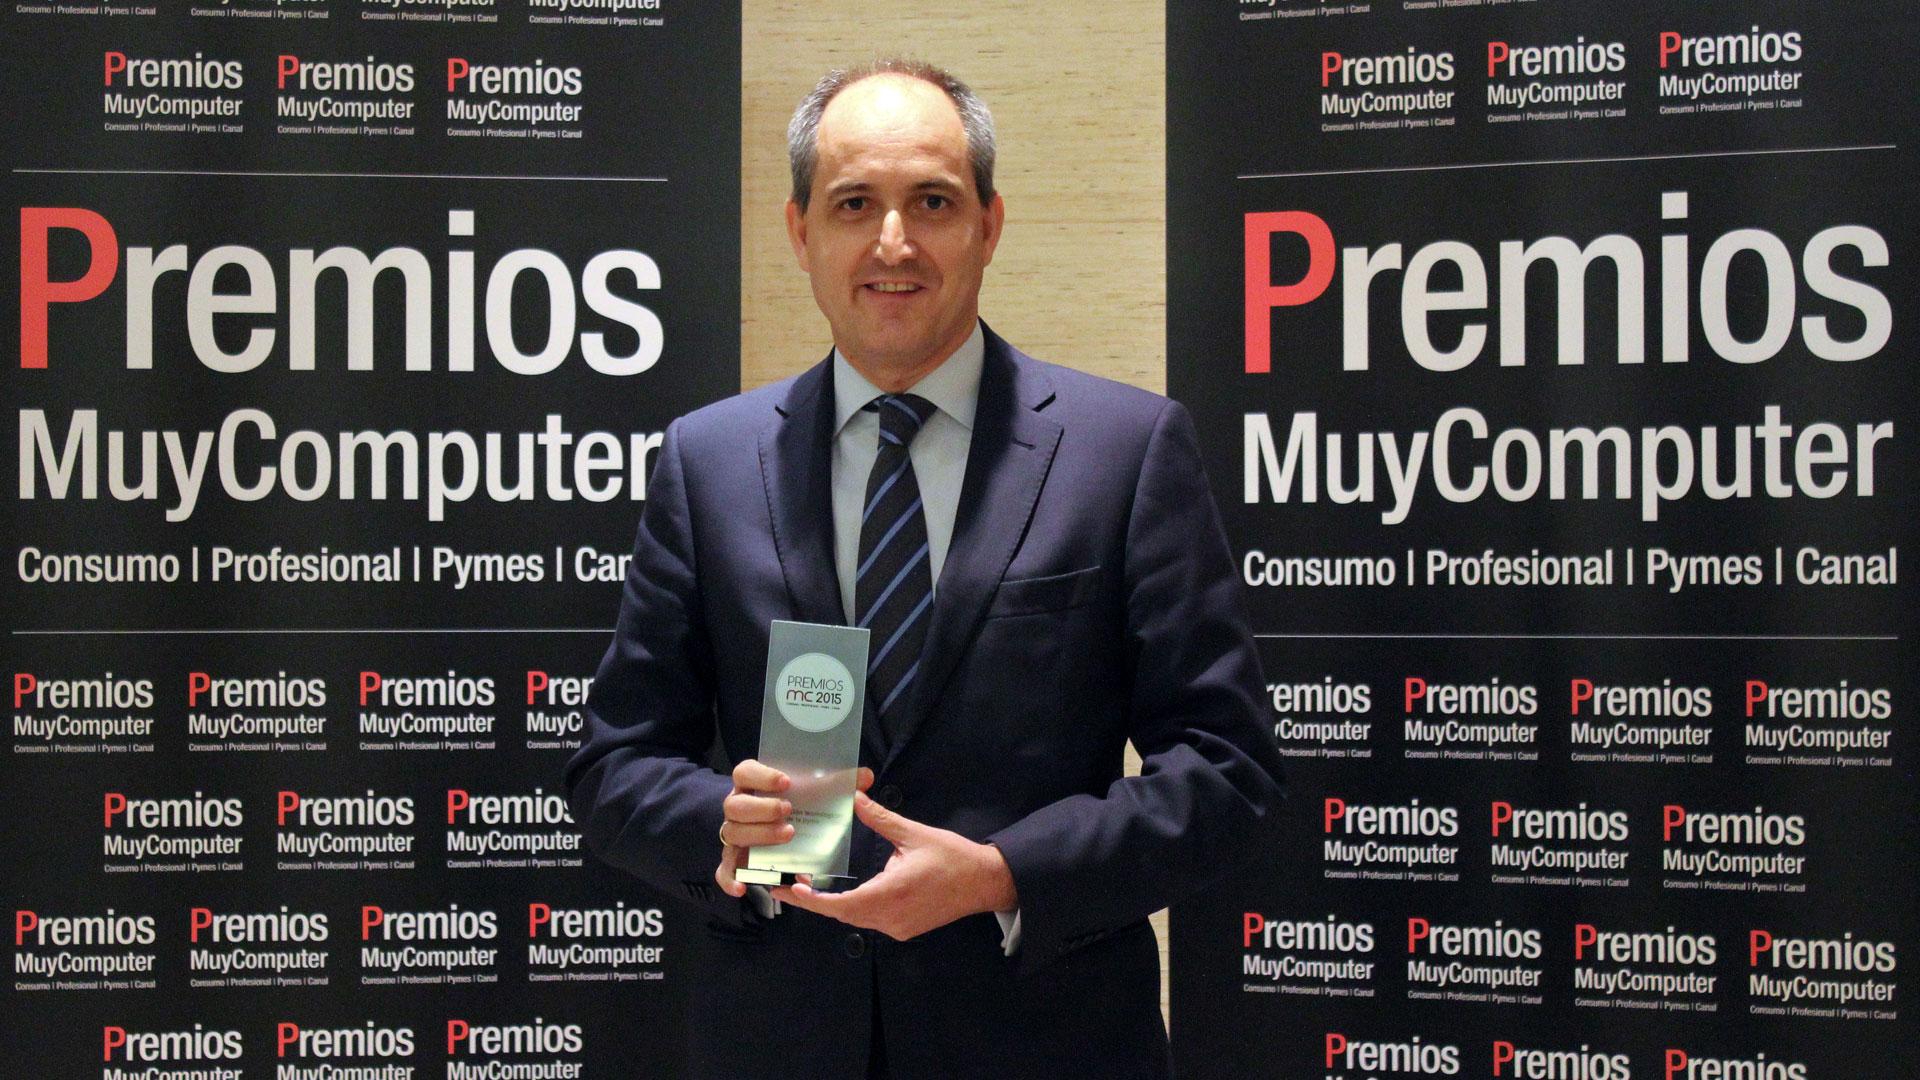 premios-mc2015-microsoft-renovacion-tecnologia-pyme